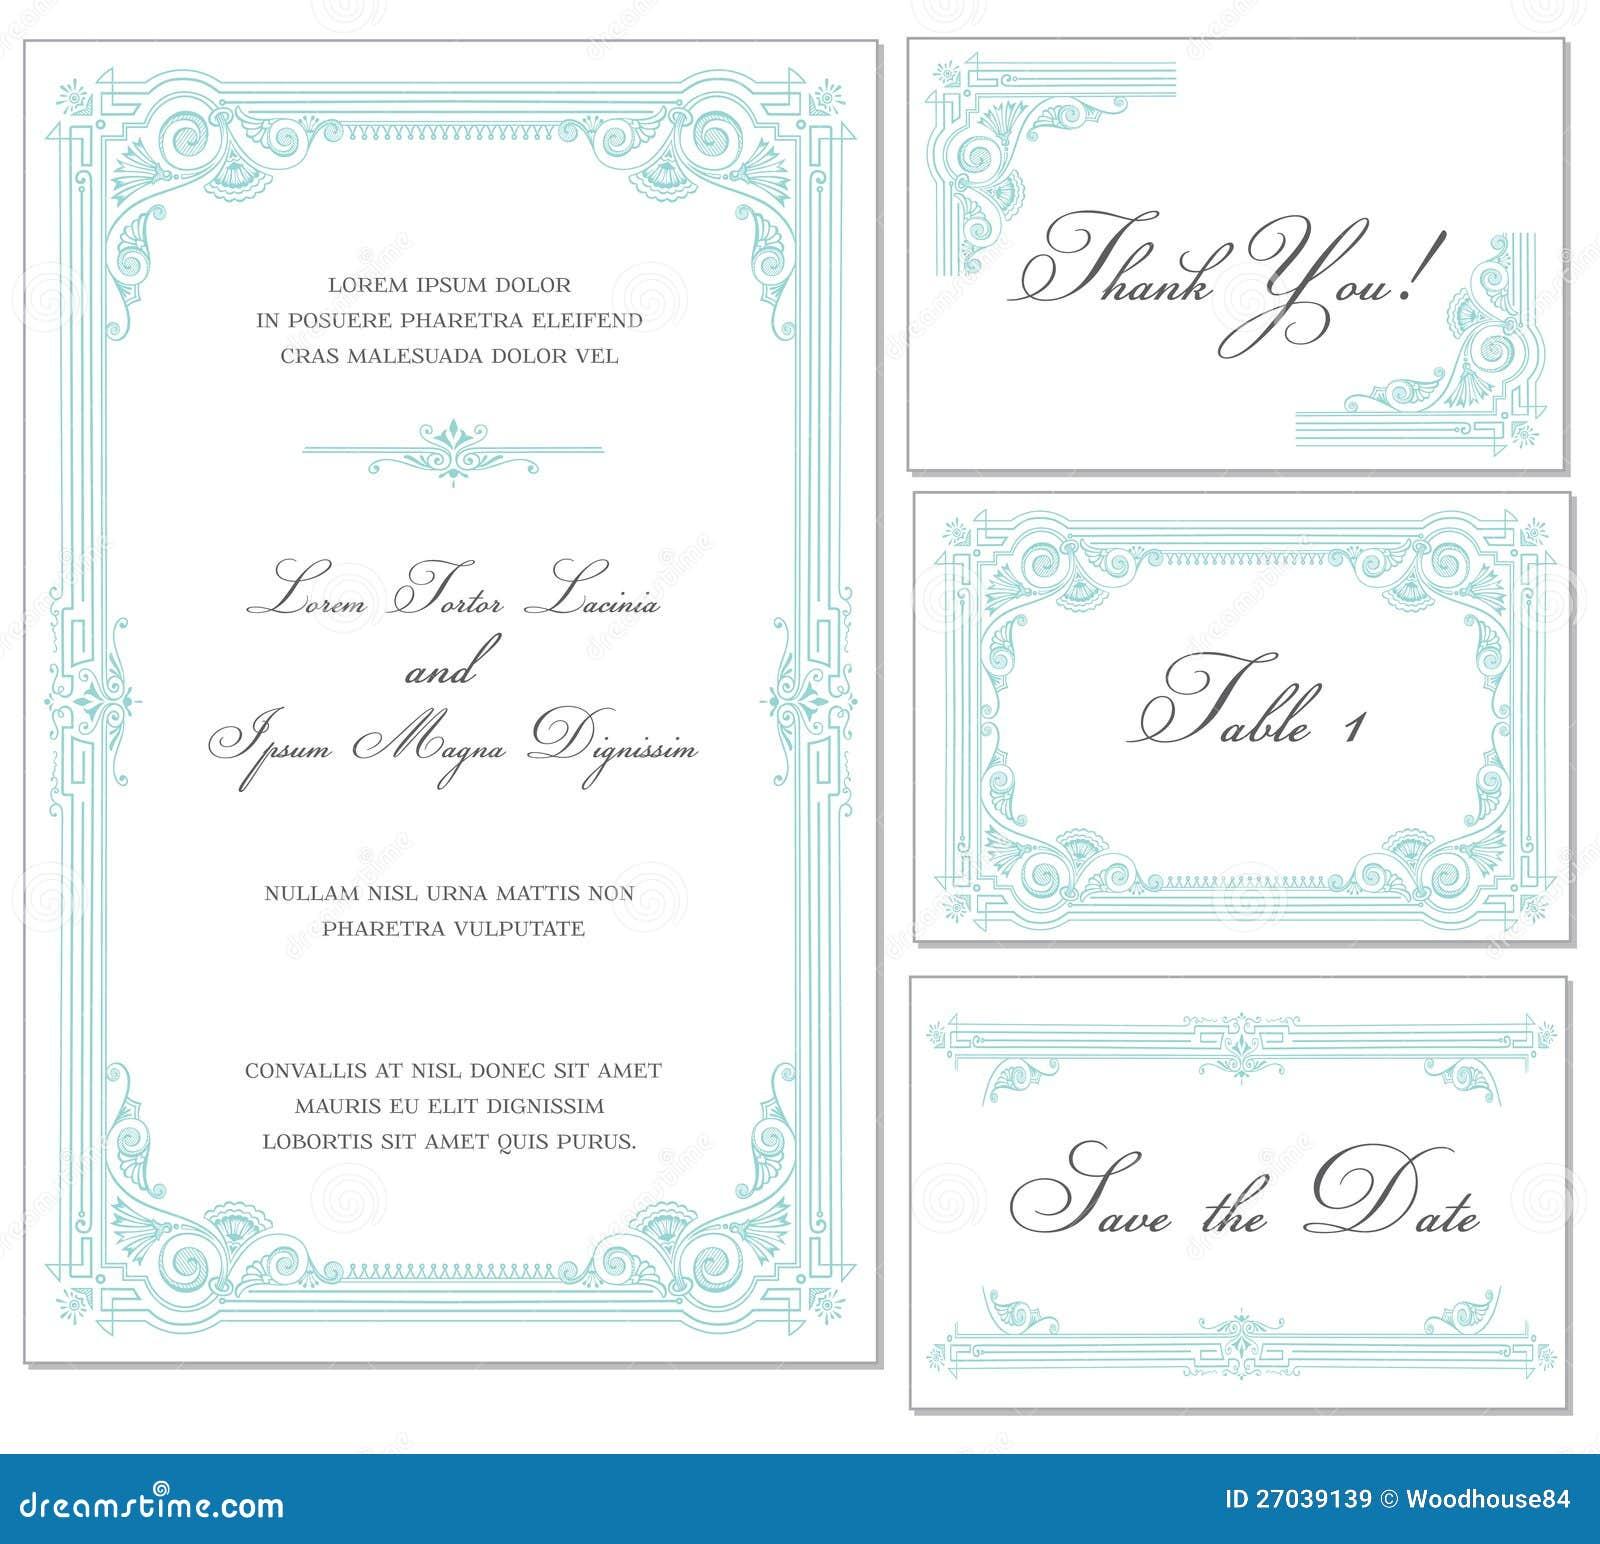 Vector Vintage Wedding Frame Set Royalty Free Stock Images ...